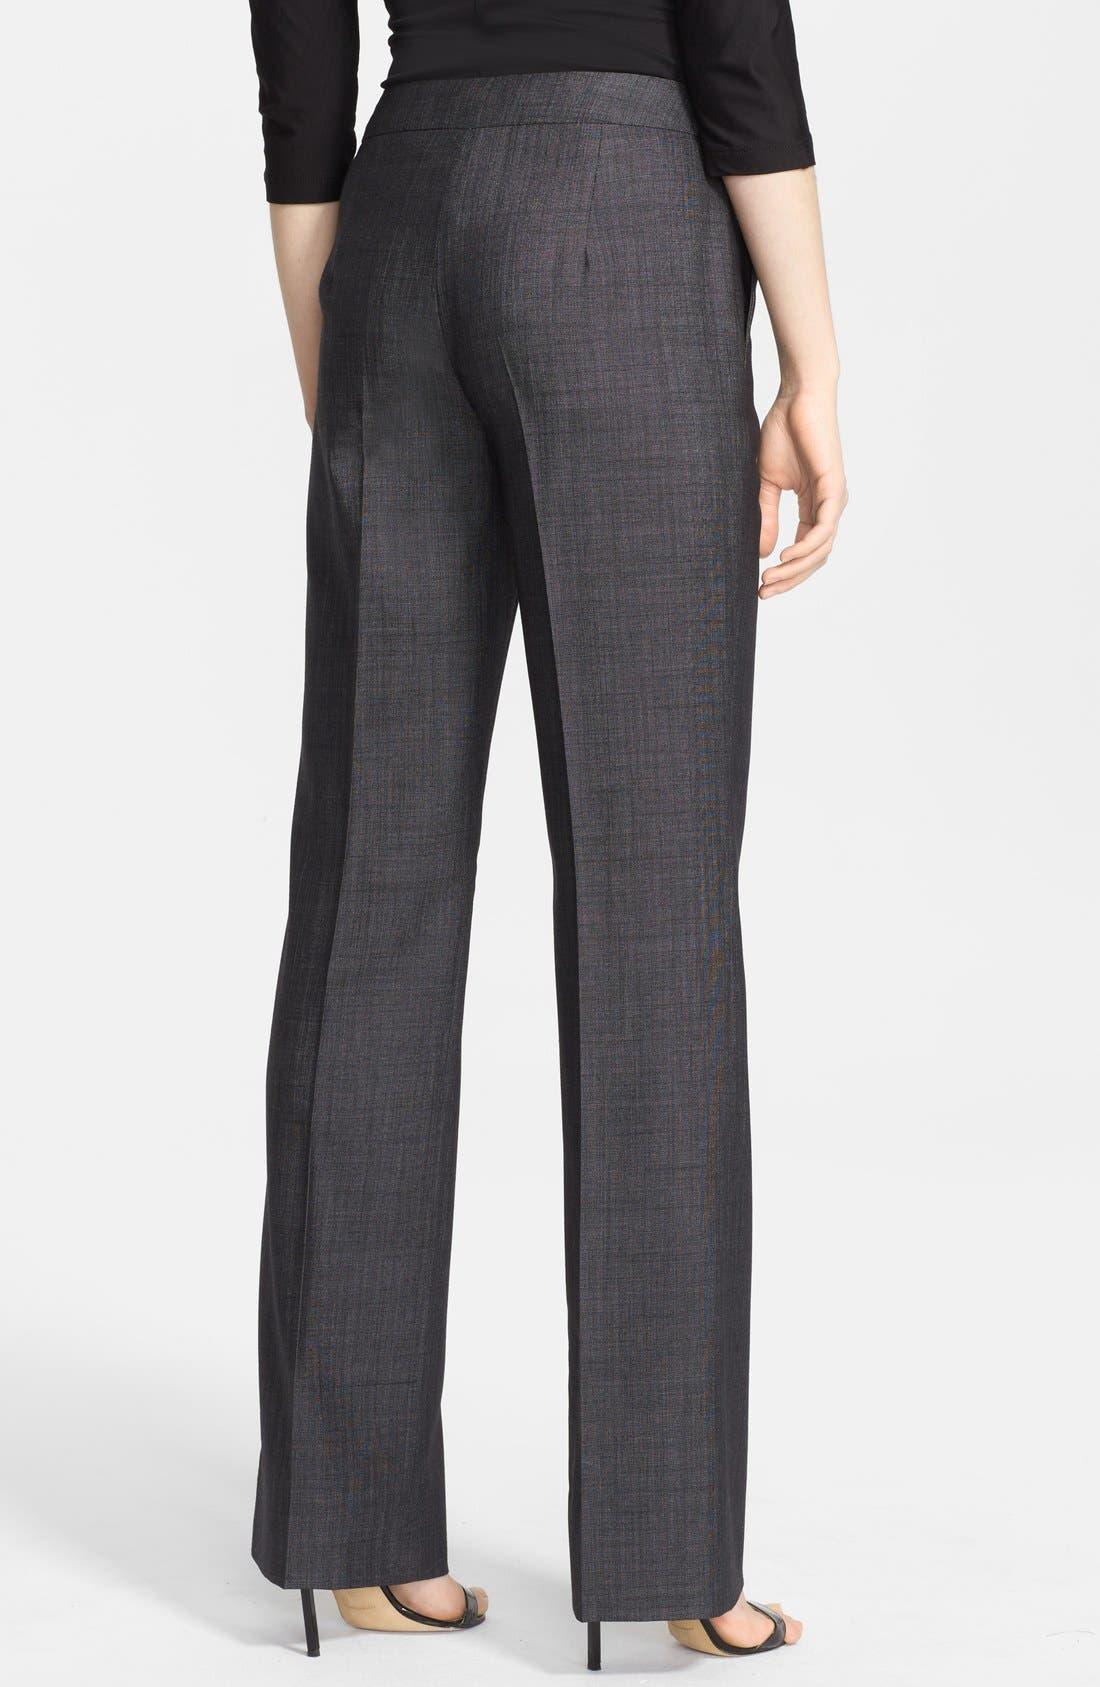 Alternate Image 2  - Max Mara 'Allesia' Wool Blend Pants